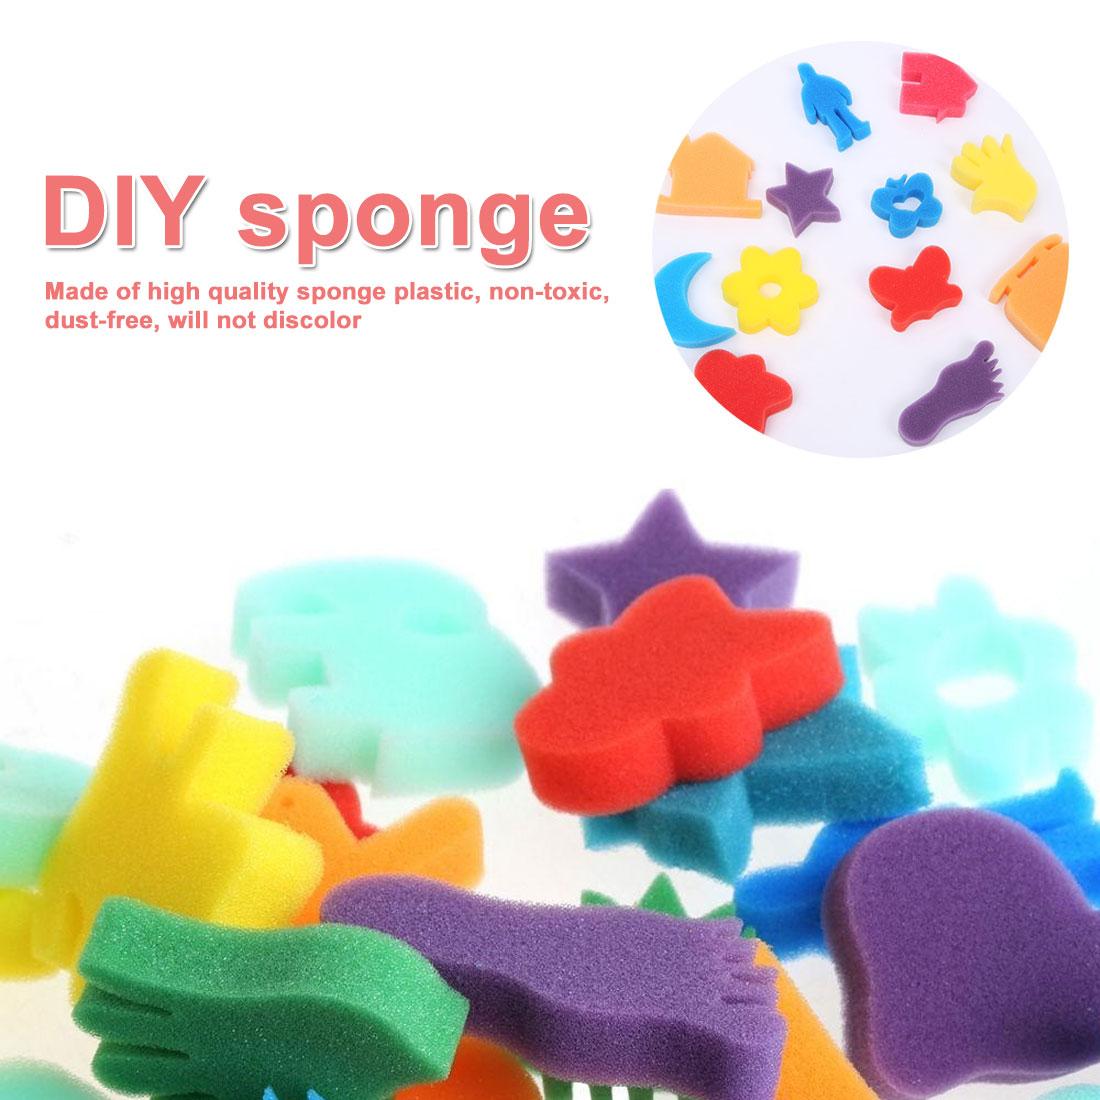 24Pcs Sponge Set Children Kids Art Craft Painting DIY Toy Home Education Toy Baby Educational Doodle Drawing Graffiti Tools